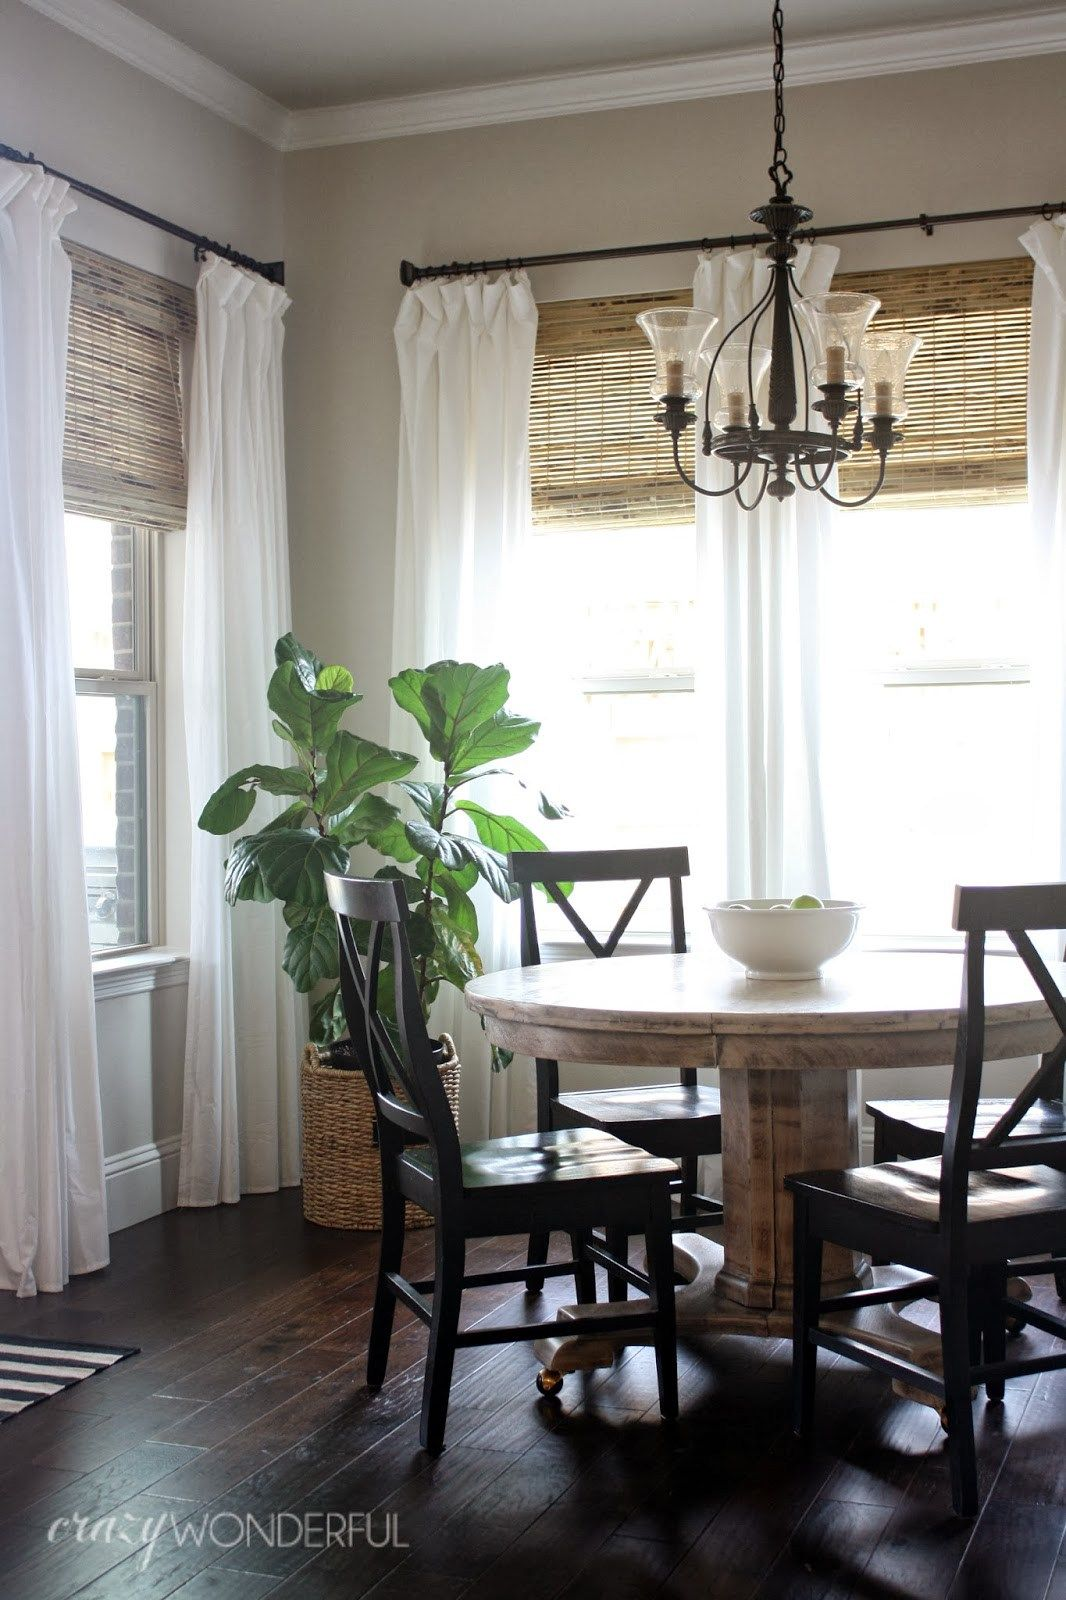 Kitchen nook window treatments  crazy wonderful woven wood shades  window treatments  pinterest